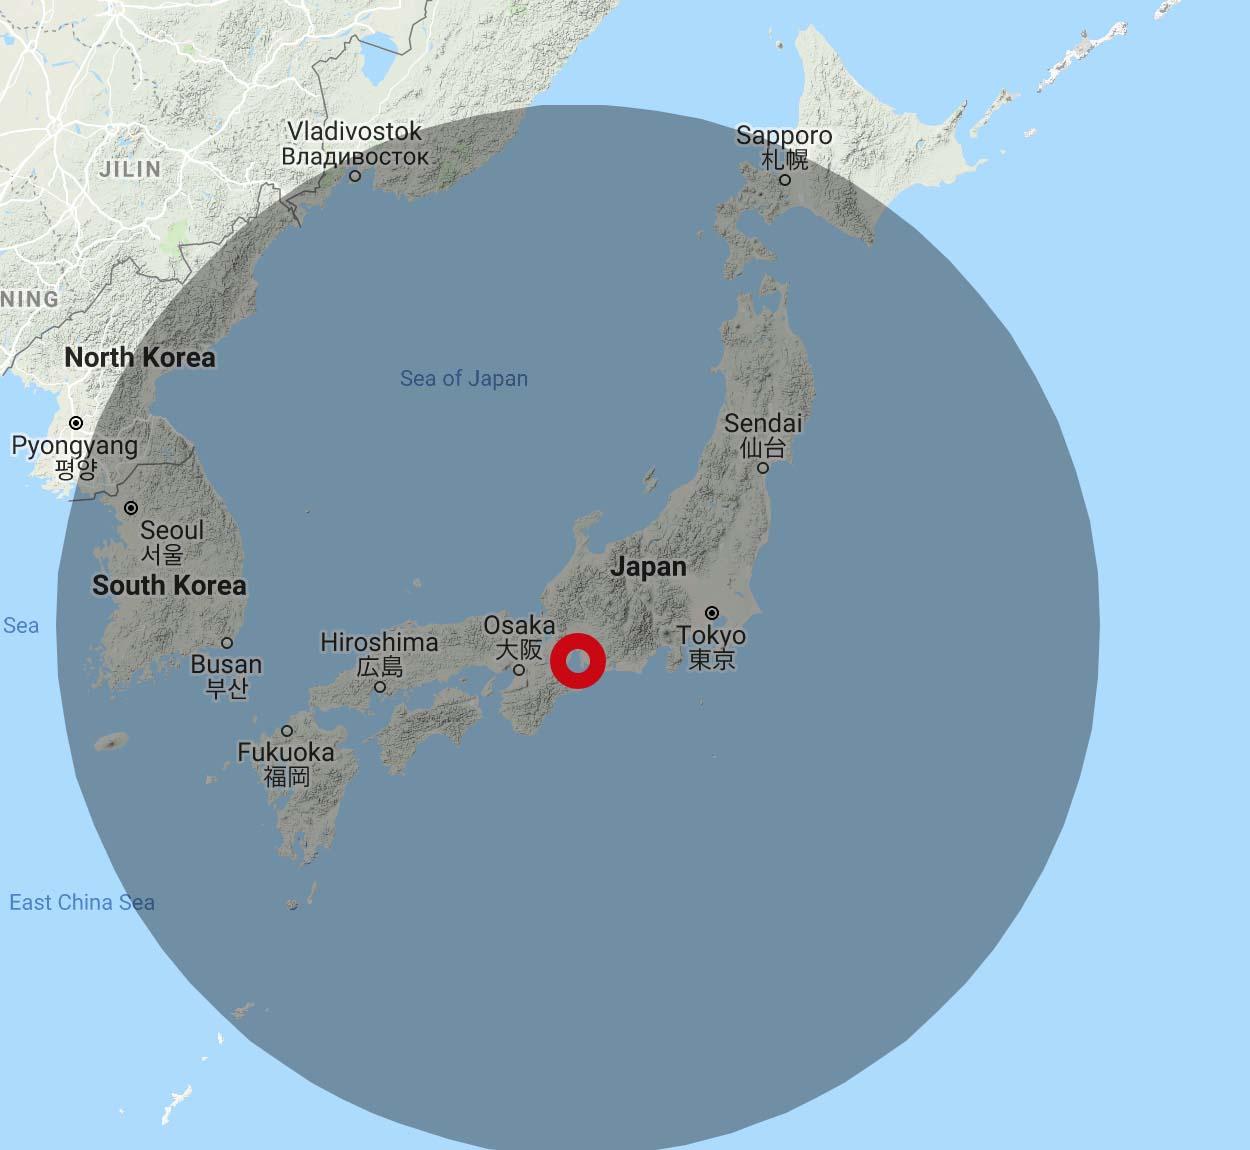 JAL 4,500 Avios Range from Nagoya